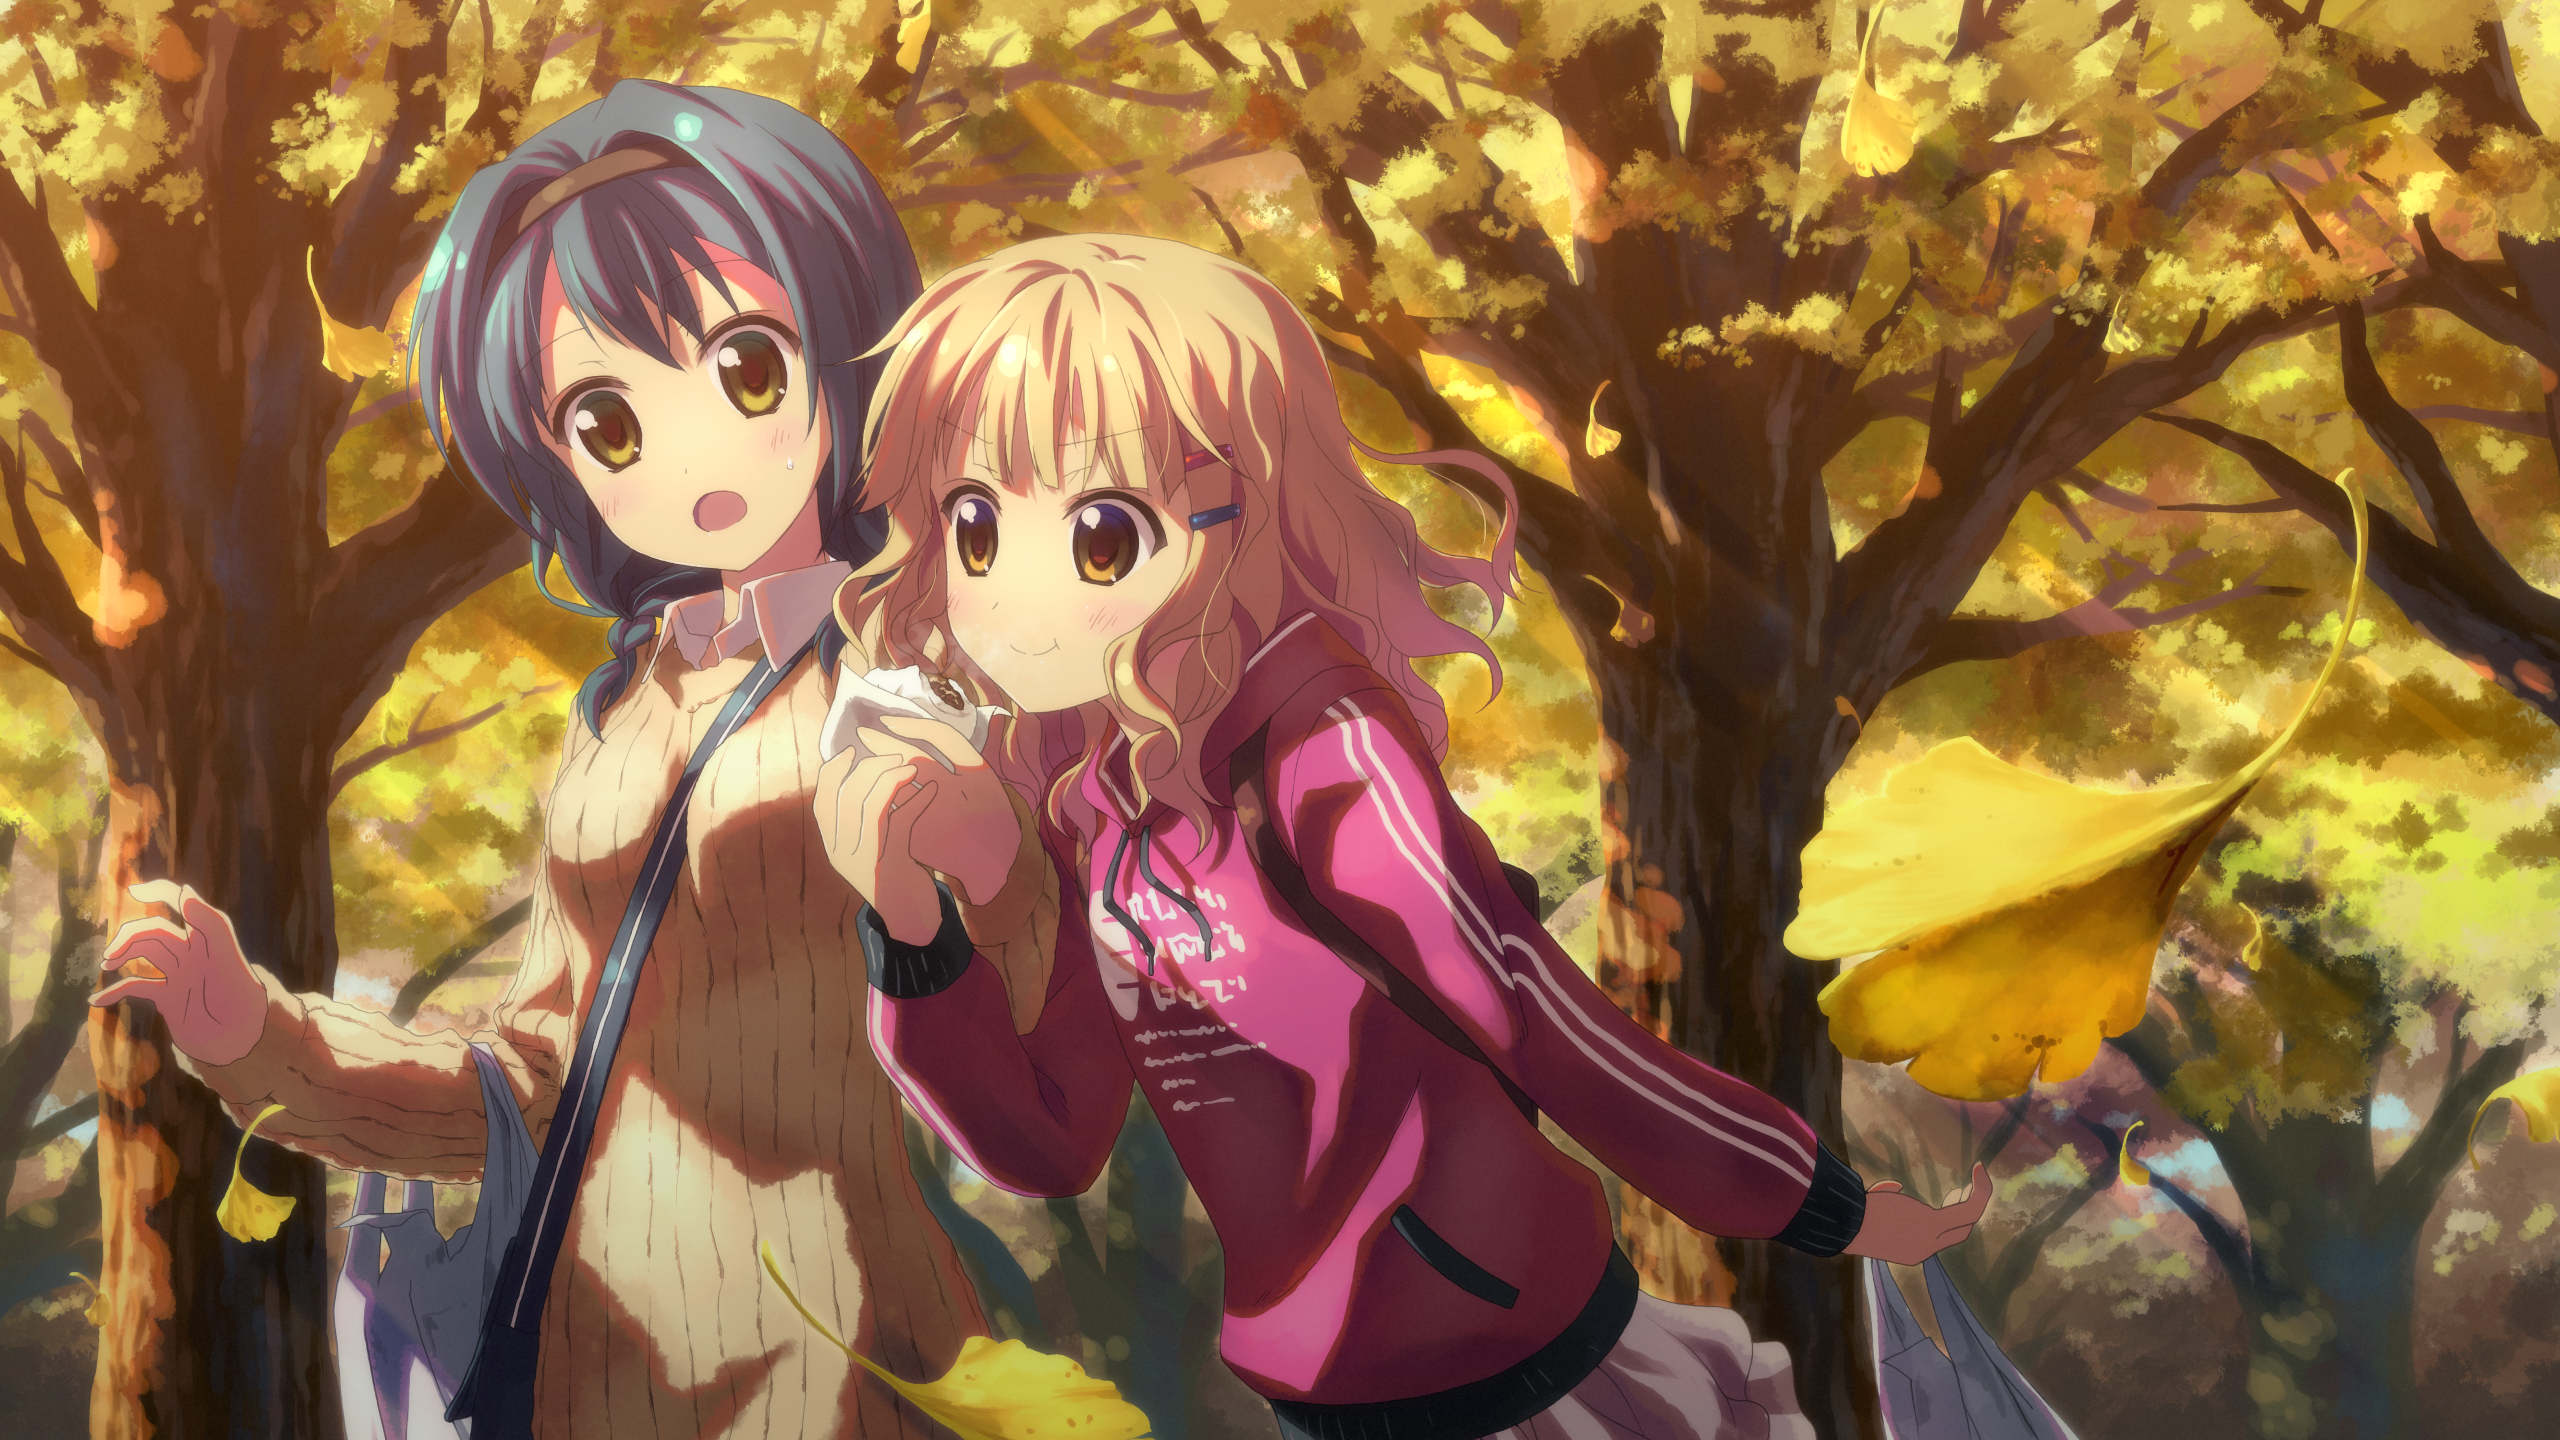 Anime 2560x1440 Yuru Yuri Furutani Himawari Oomuro Sakurako